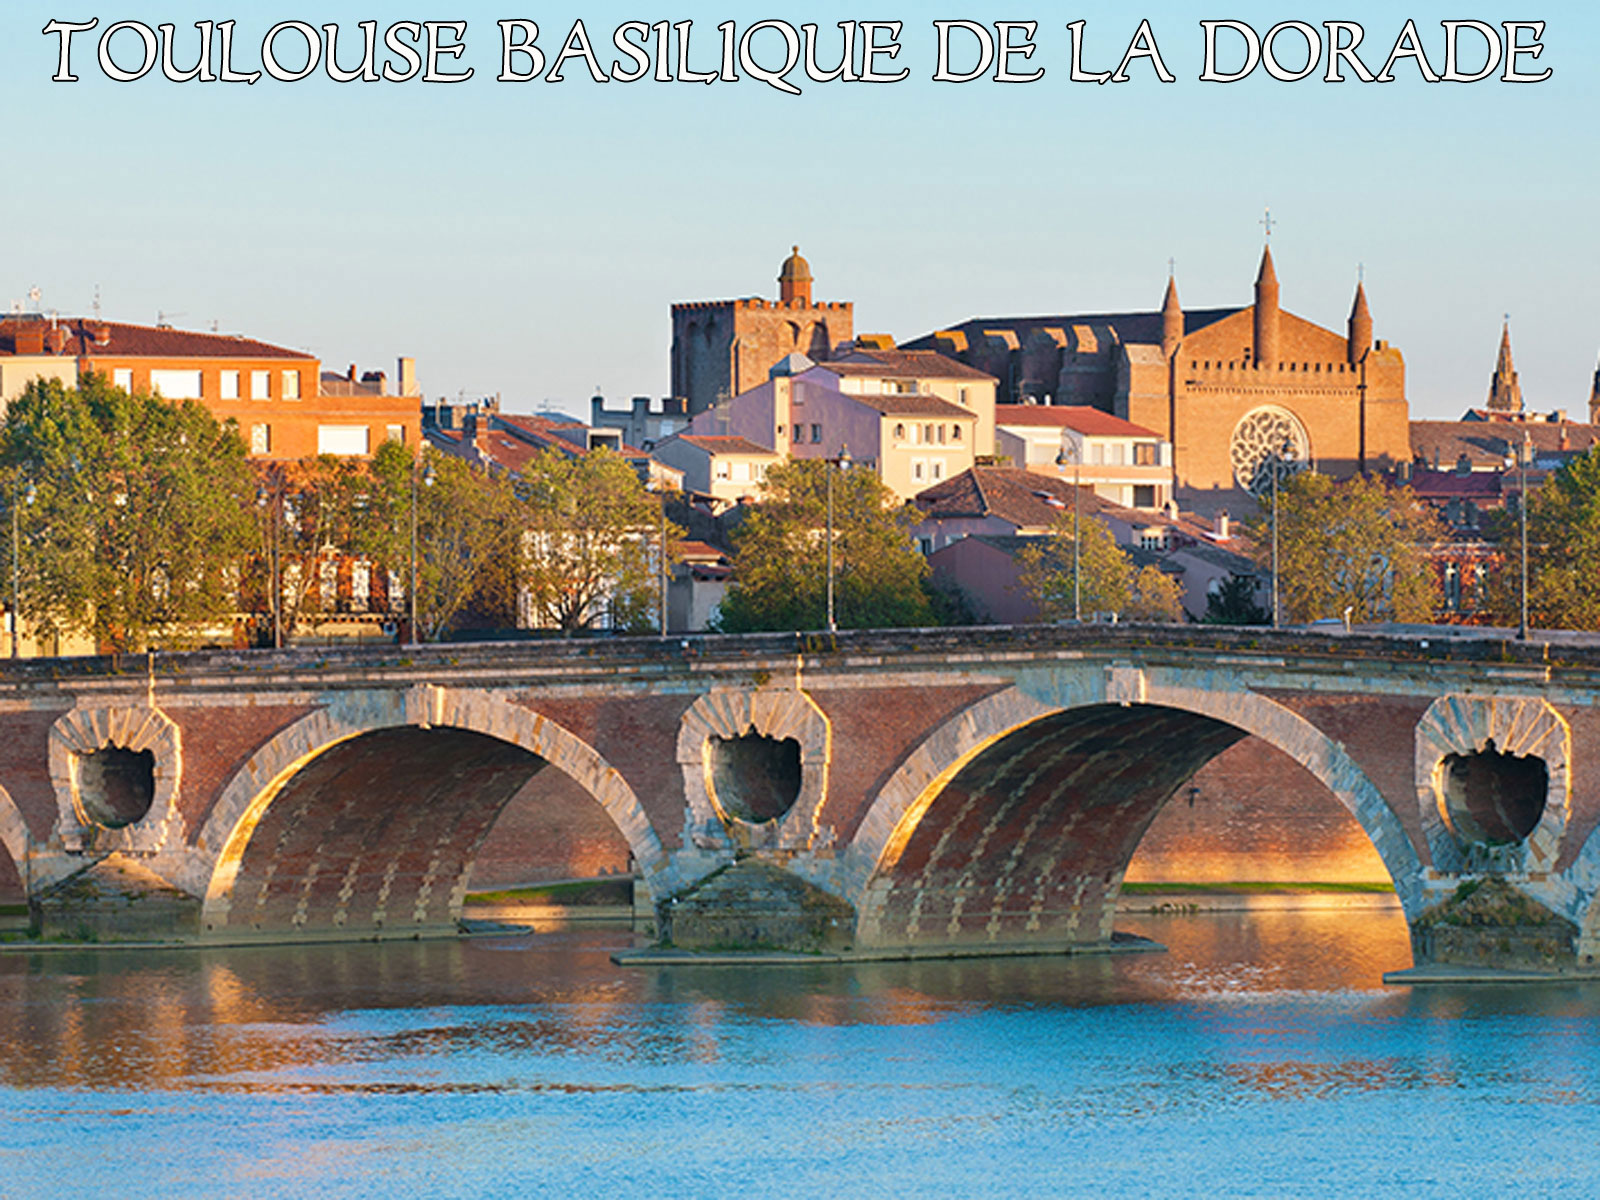 Info Notre Dame de la Daurade